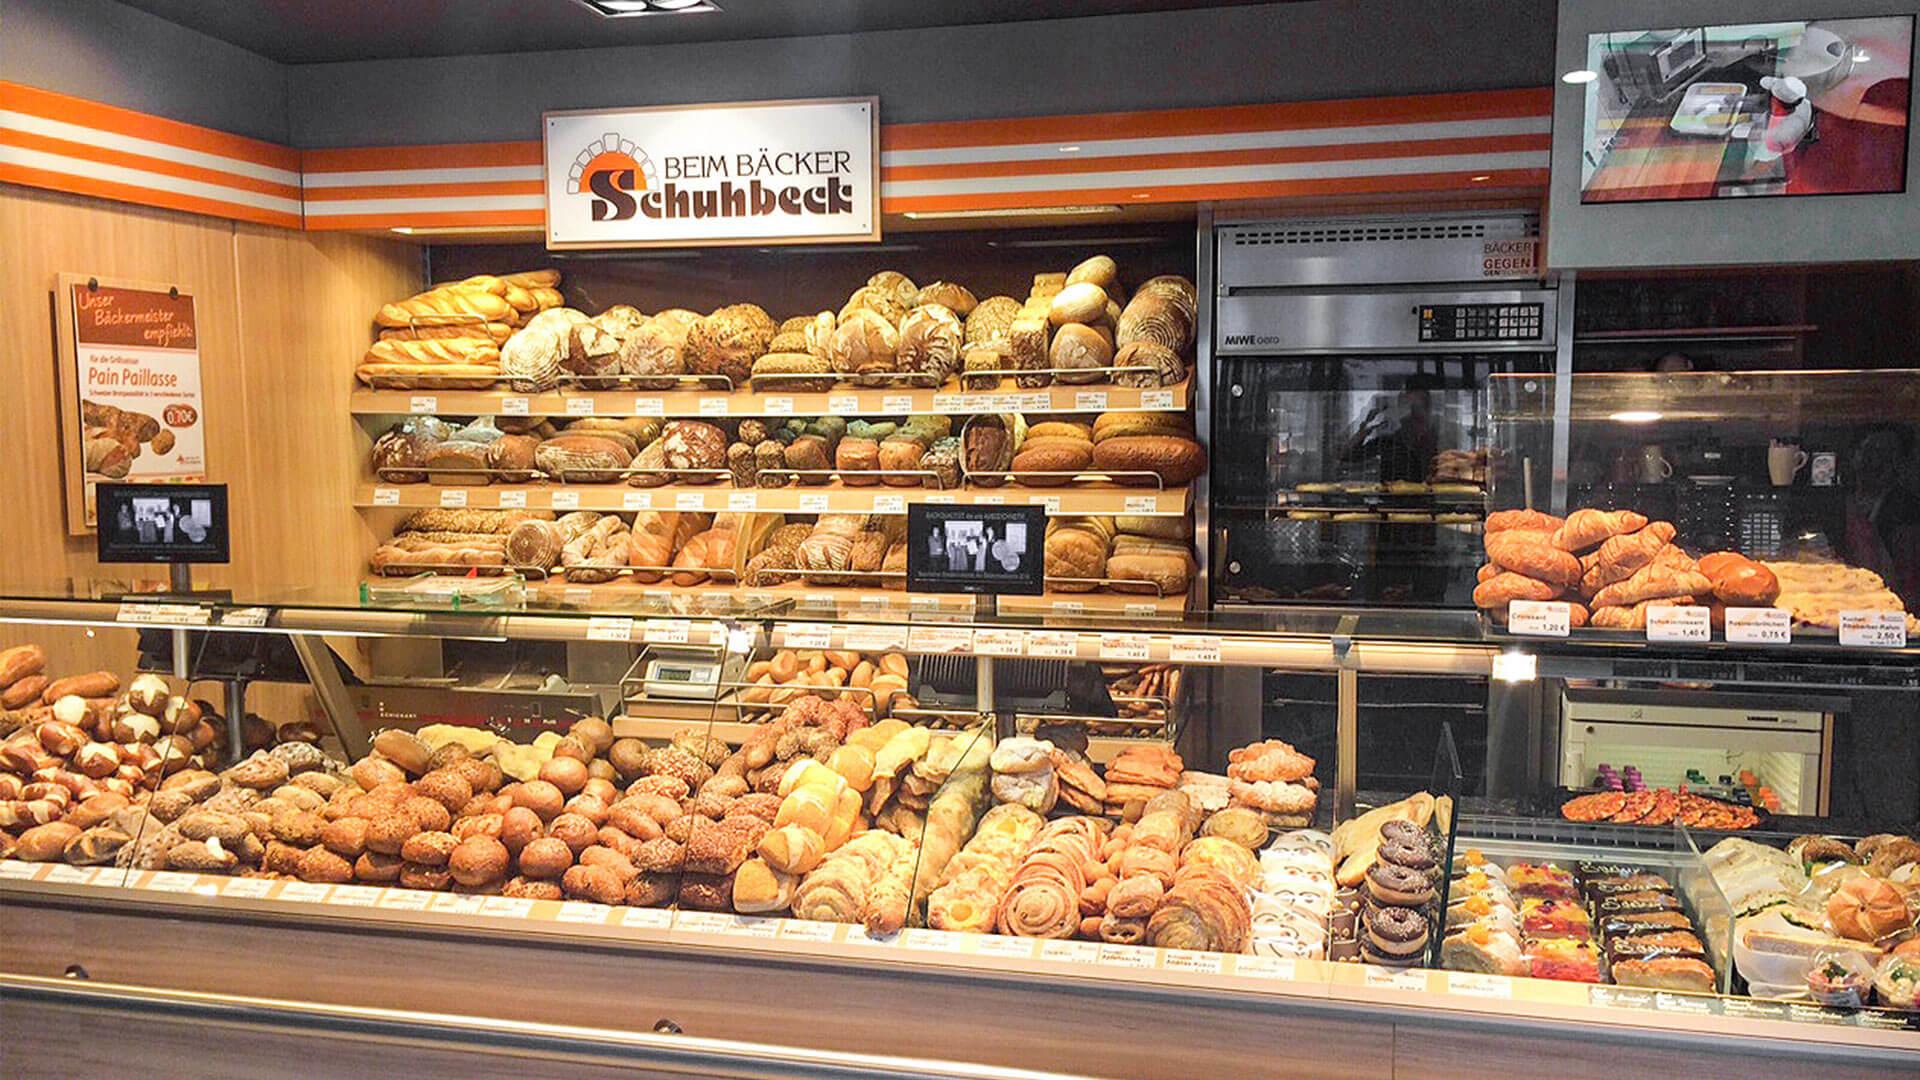 Bäckerei Schuhbeck Brotladen Frasdorf (1)